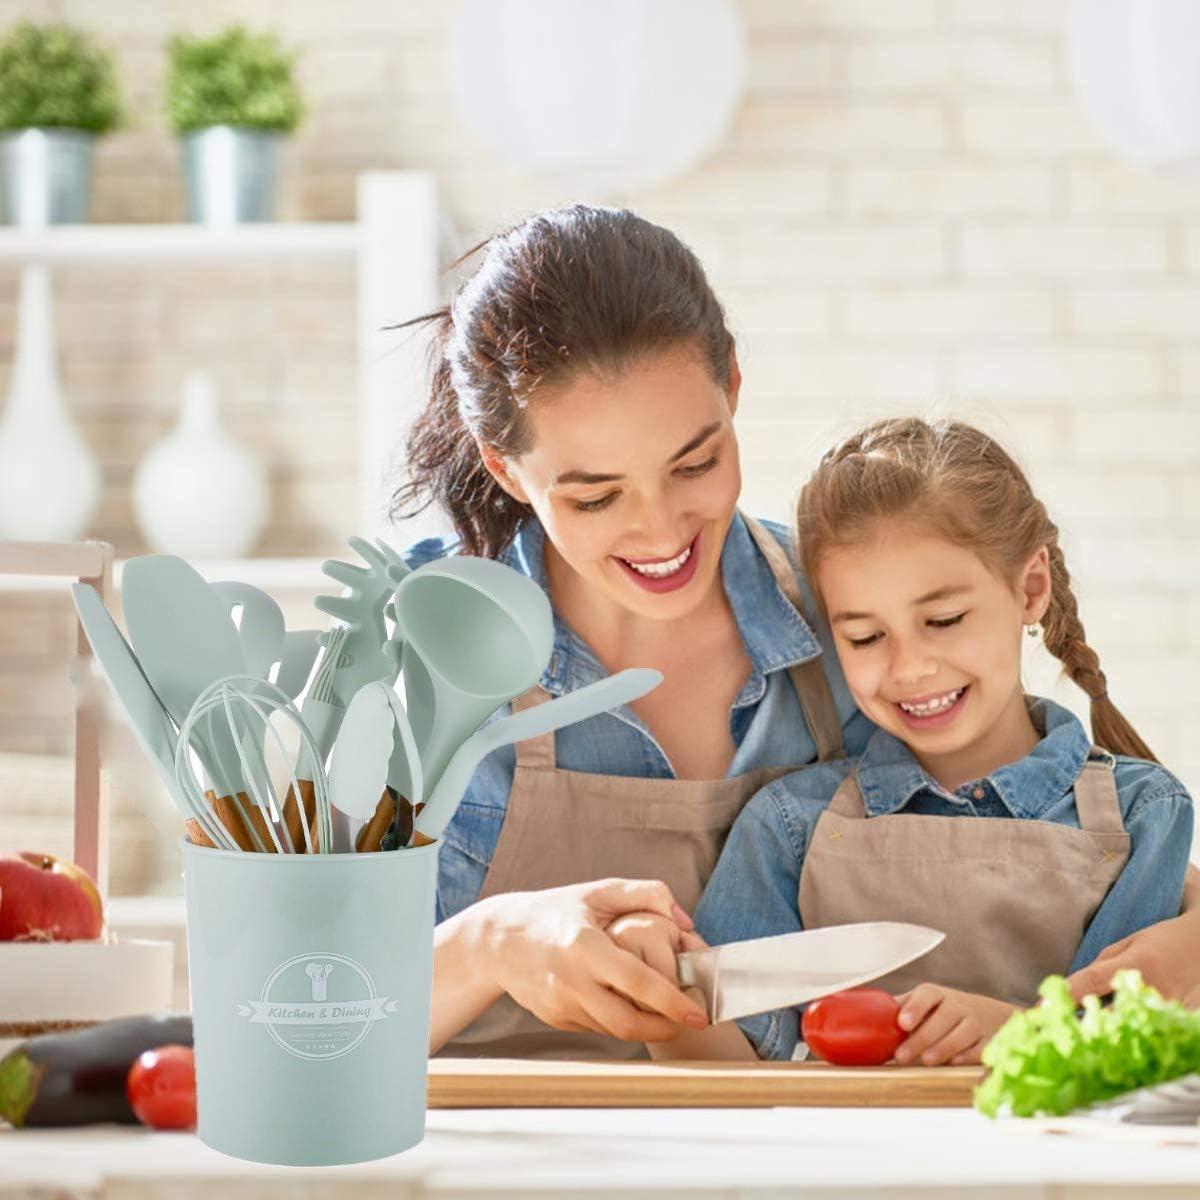 SaiXuan Utensilios Cocina de Silicona,Antiadherente con Mango de Madera para Utensilios,No T/óxicas Resistentes Al Calor Utensilios De Cocina Antiadherente 12 Piezas+12 S Ganchos